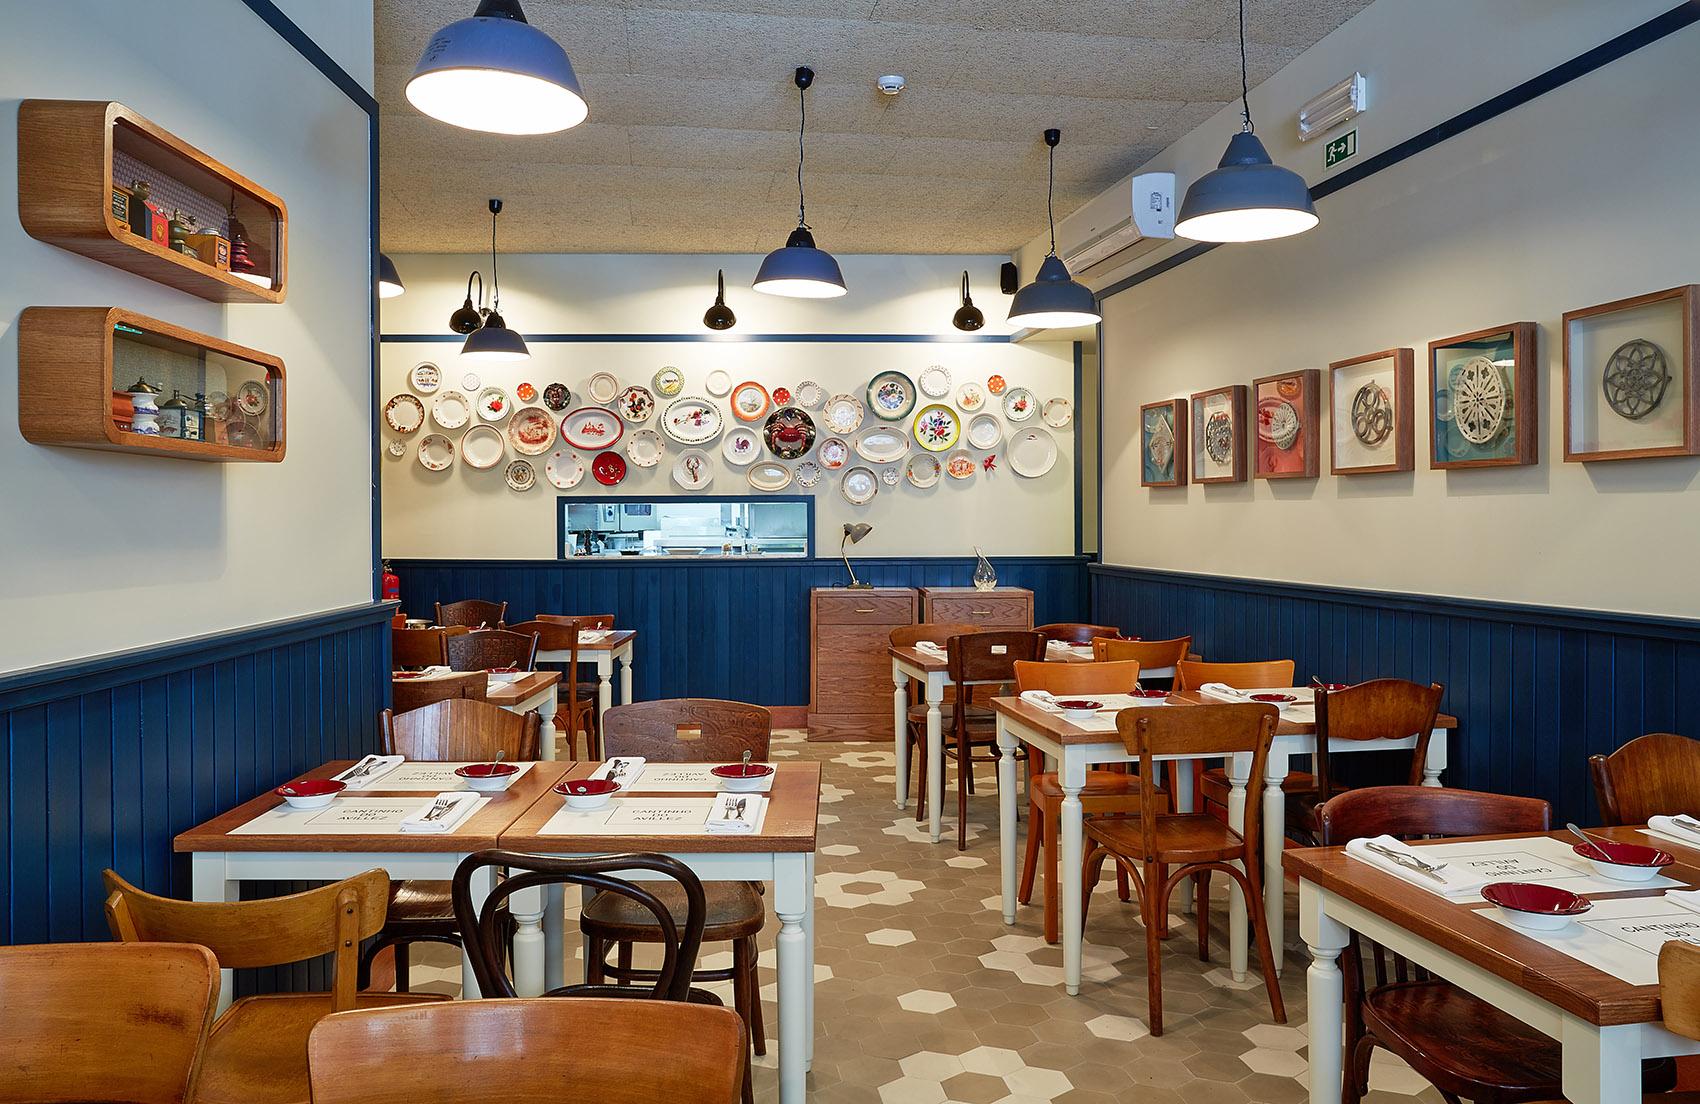 Salle du restaurant Cantinho do Avillez - Porto